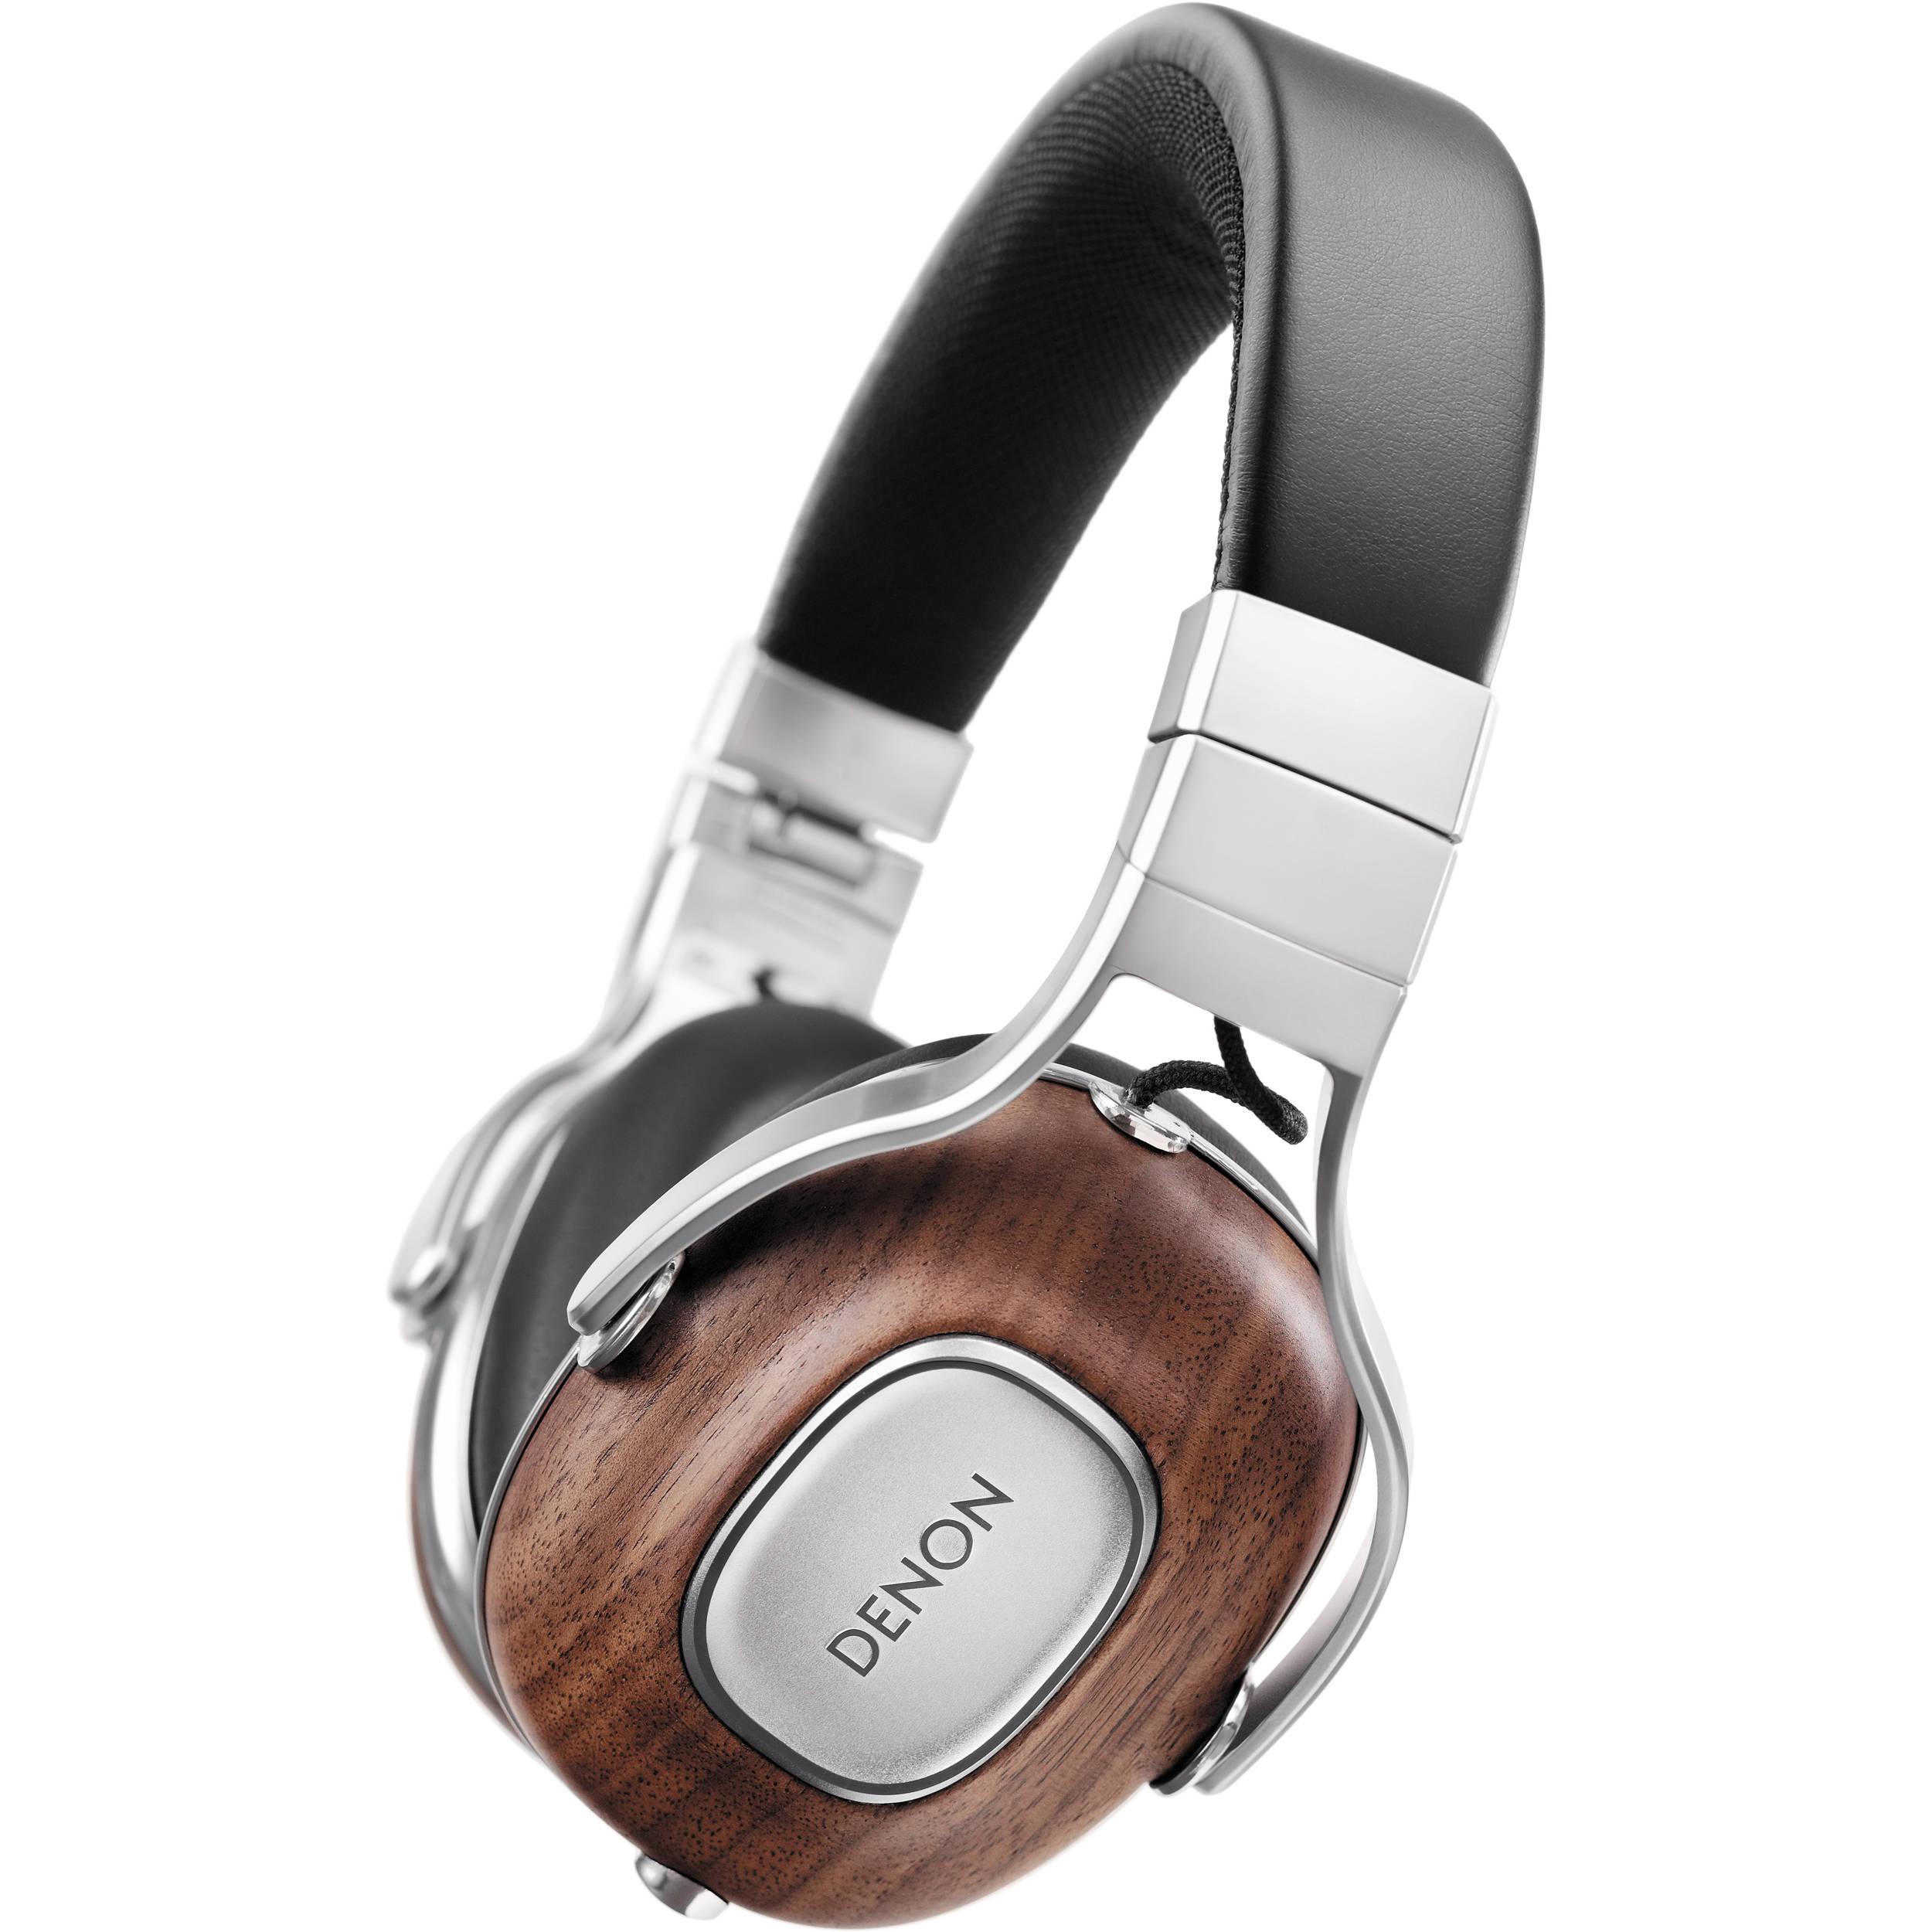 Good Headphones For Iphone